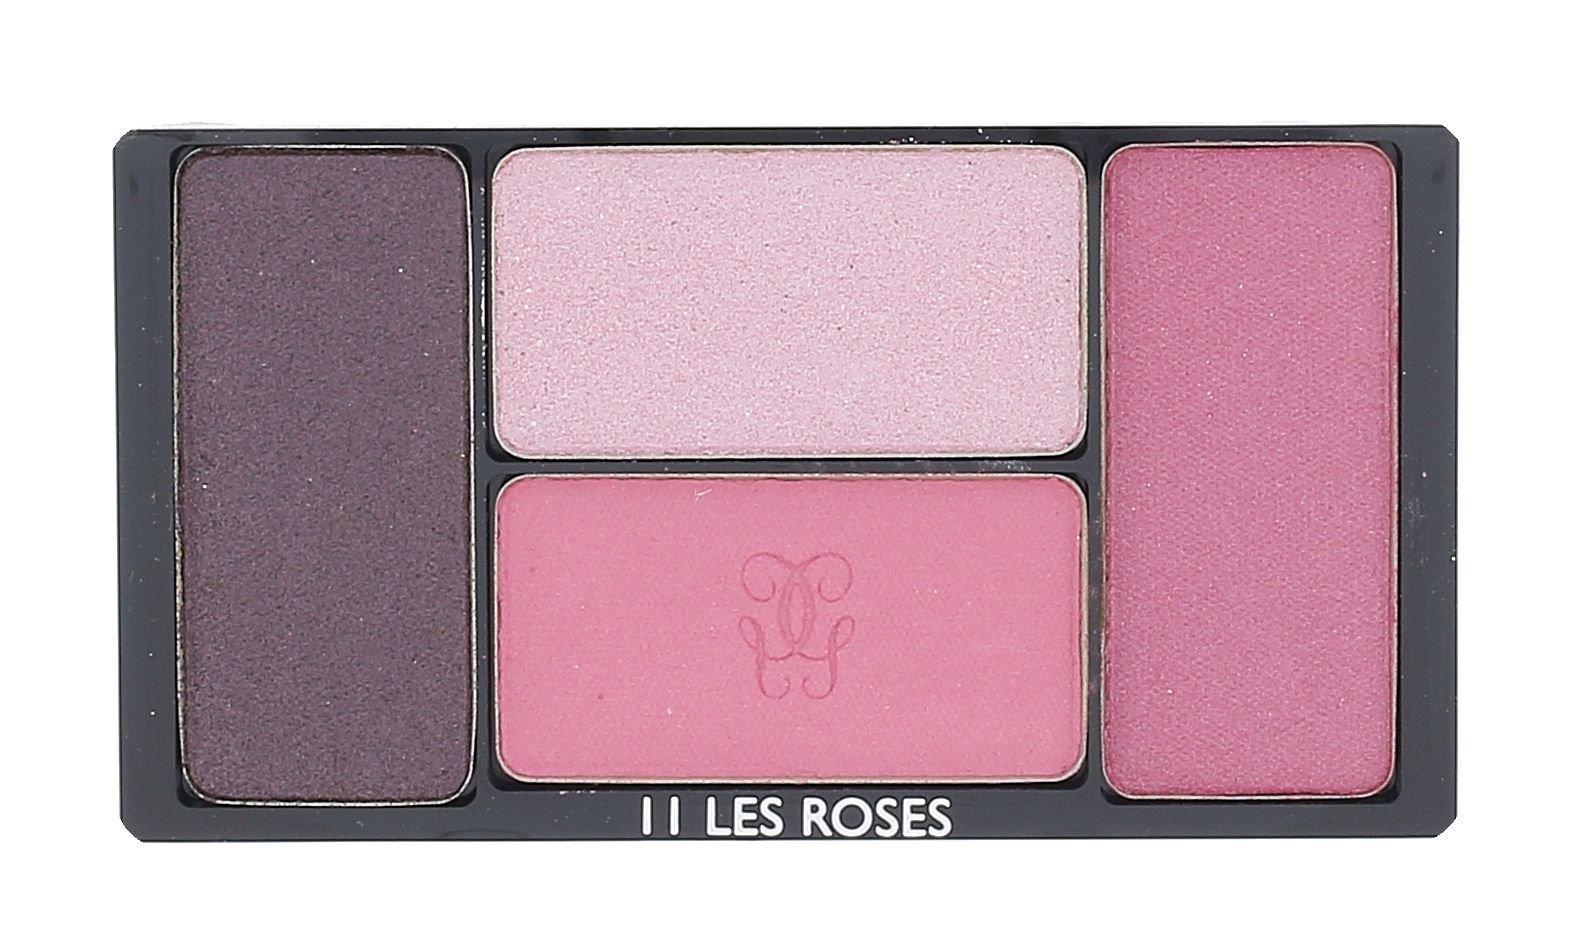 Guerlain Ecrin 4 Couleurs Cosmetic 7,2ml 11 Les Roses